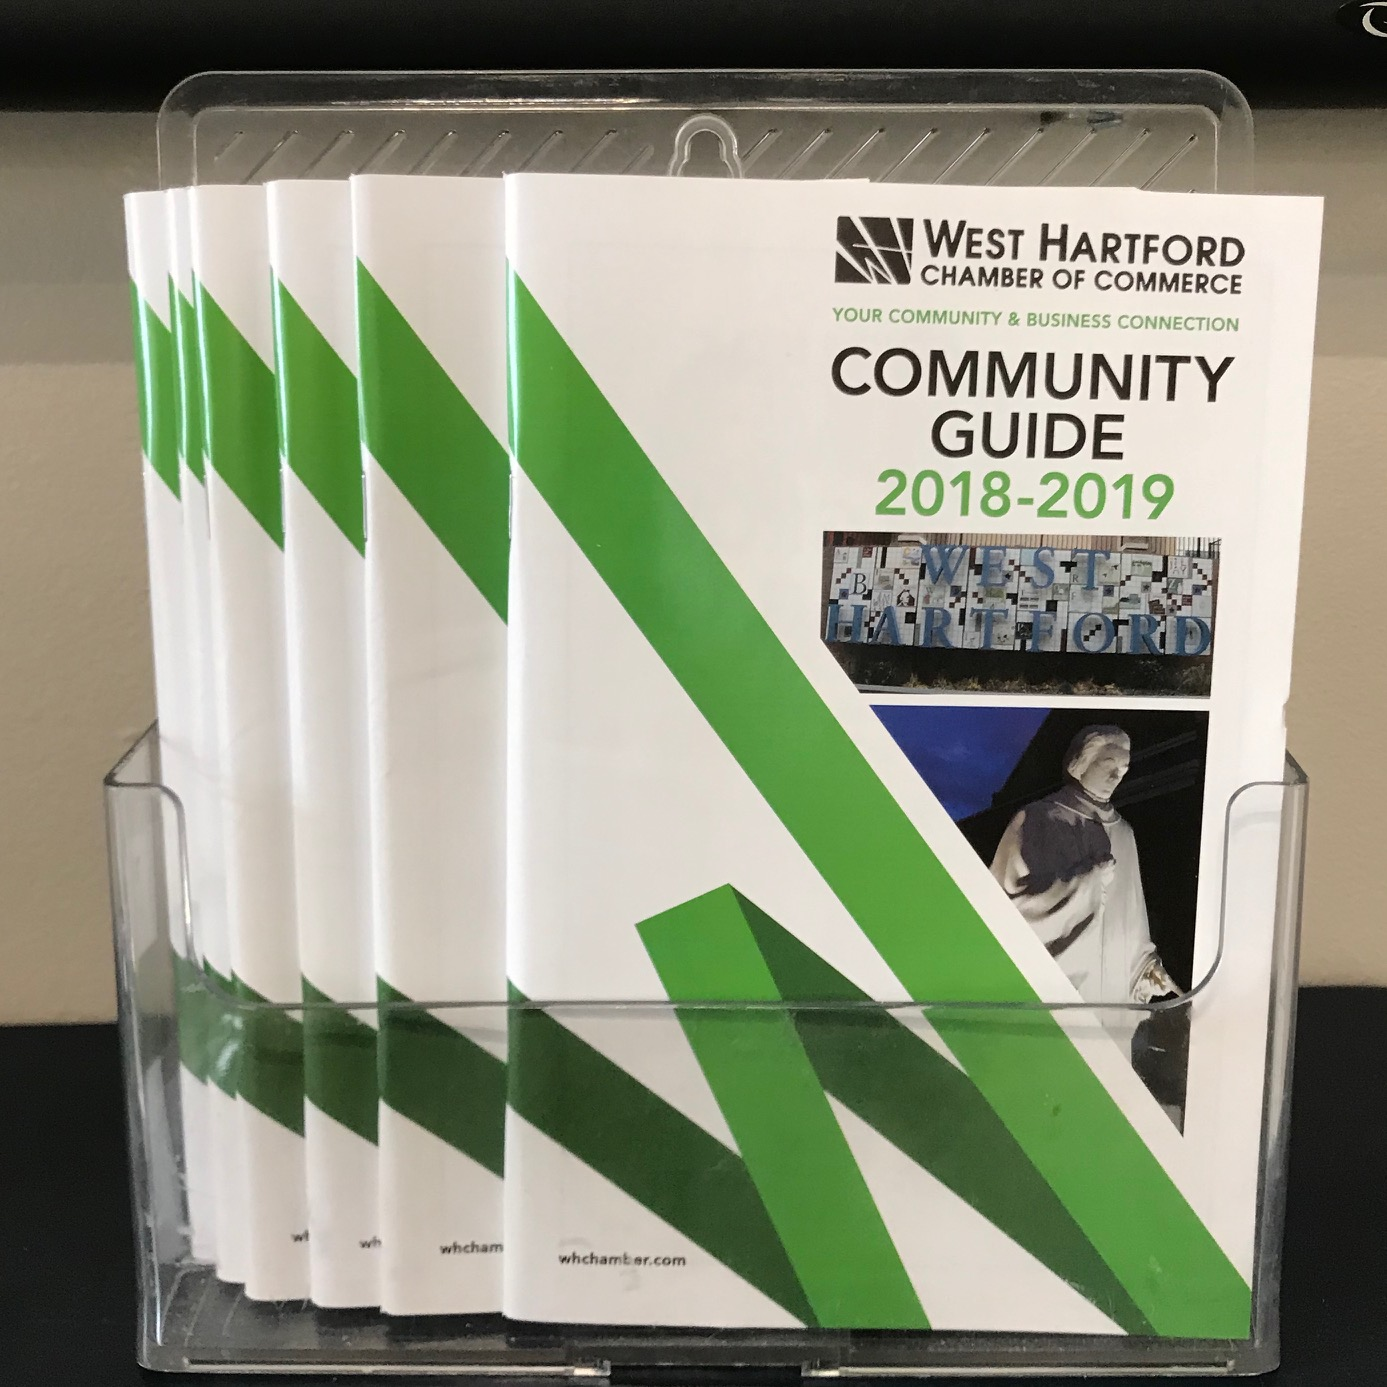 2018-2019 Community Guide